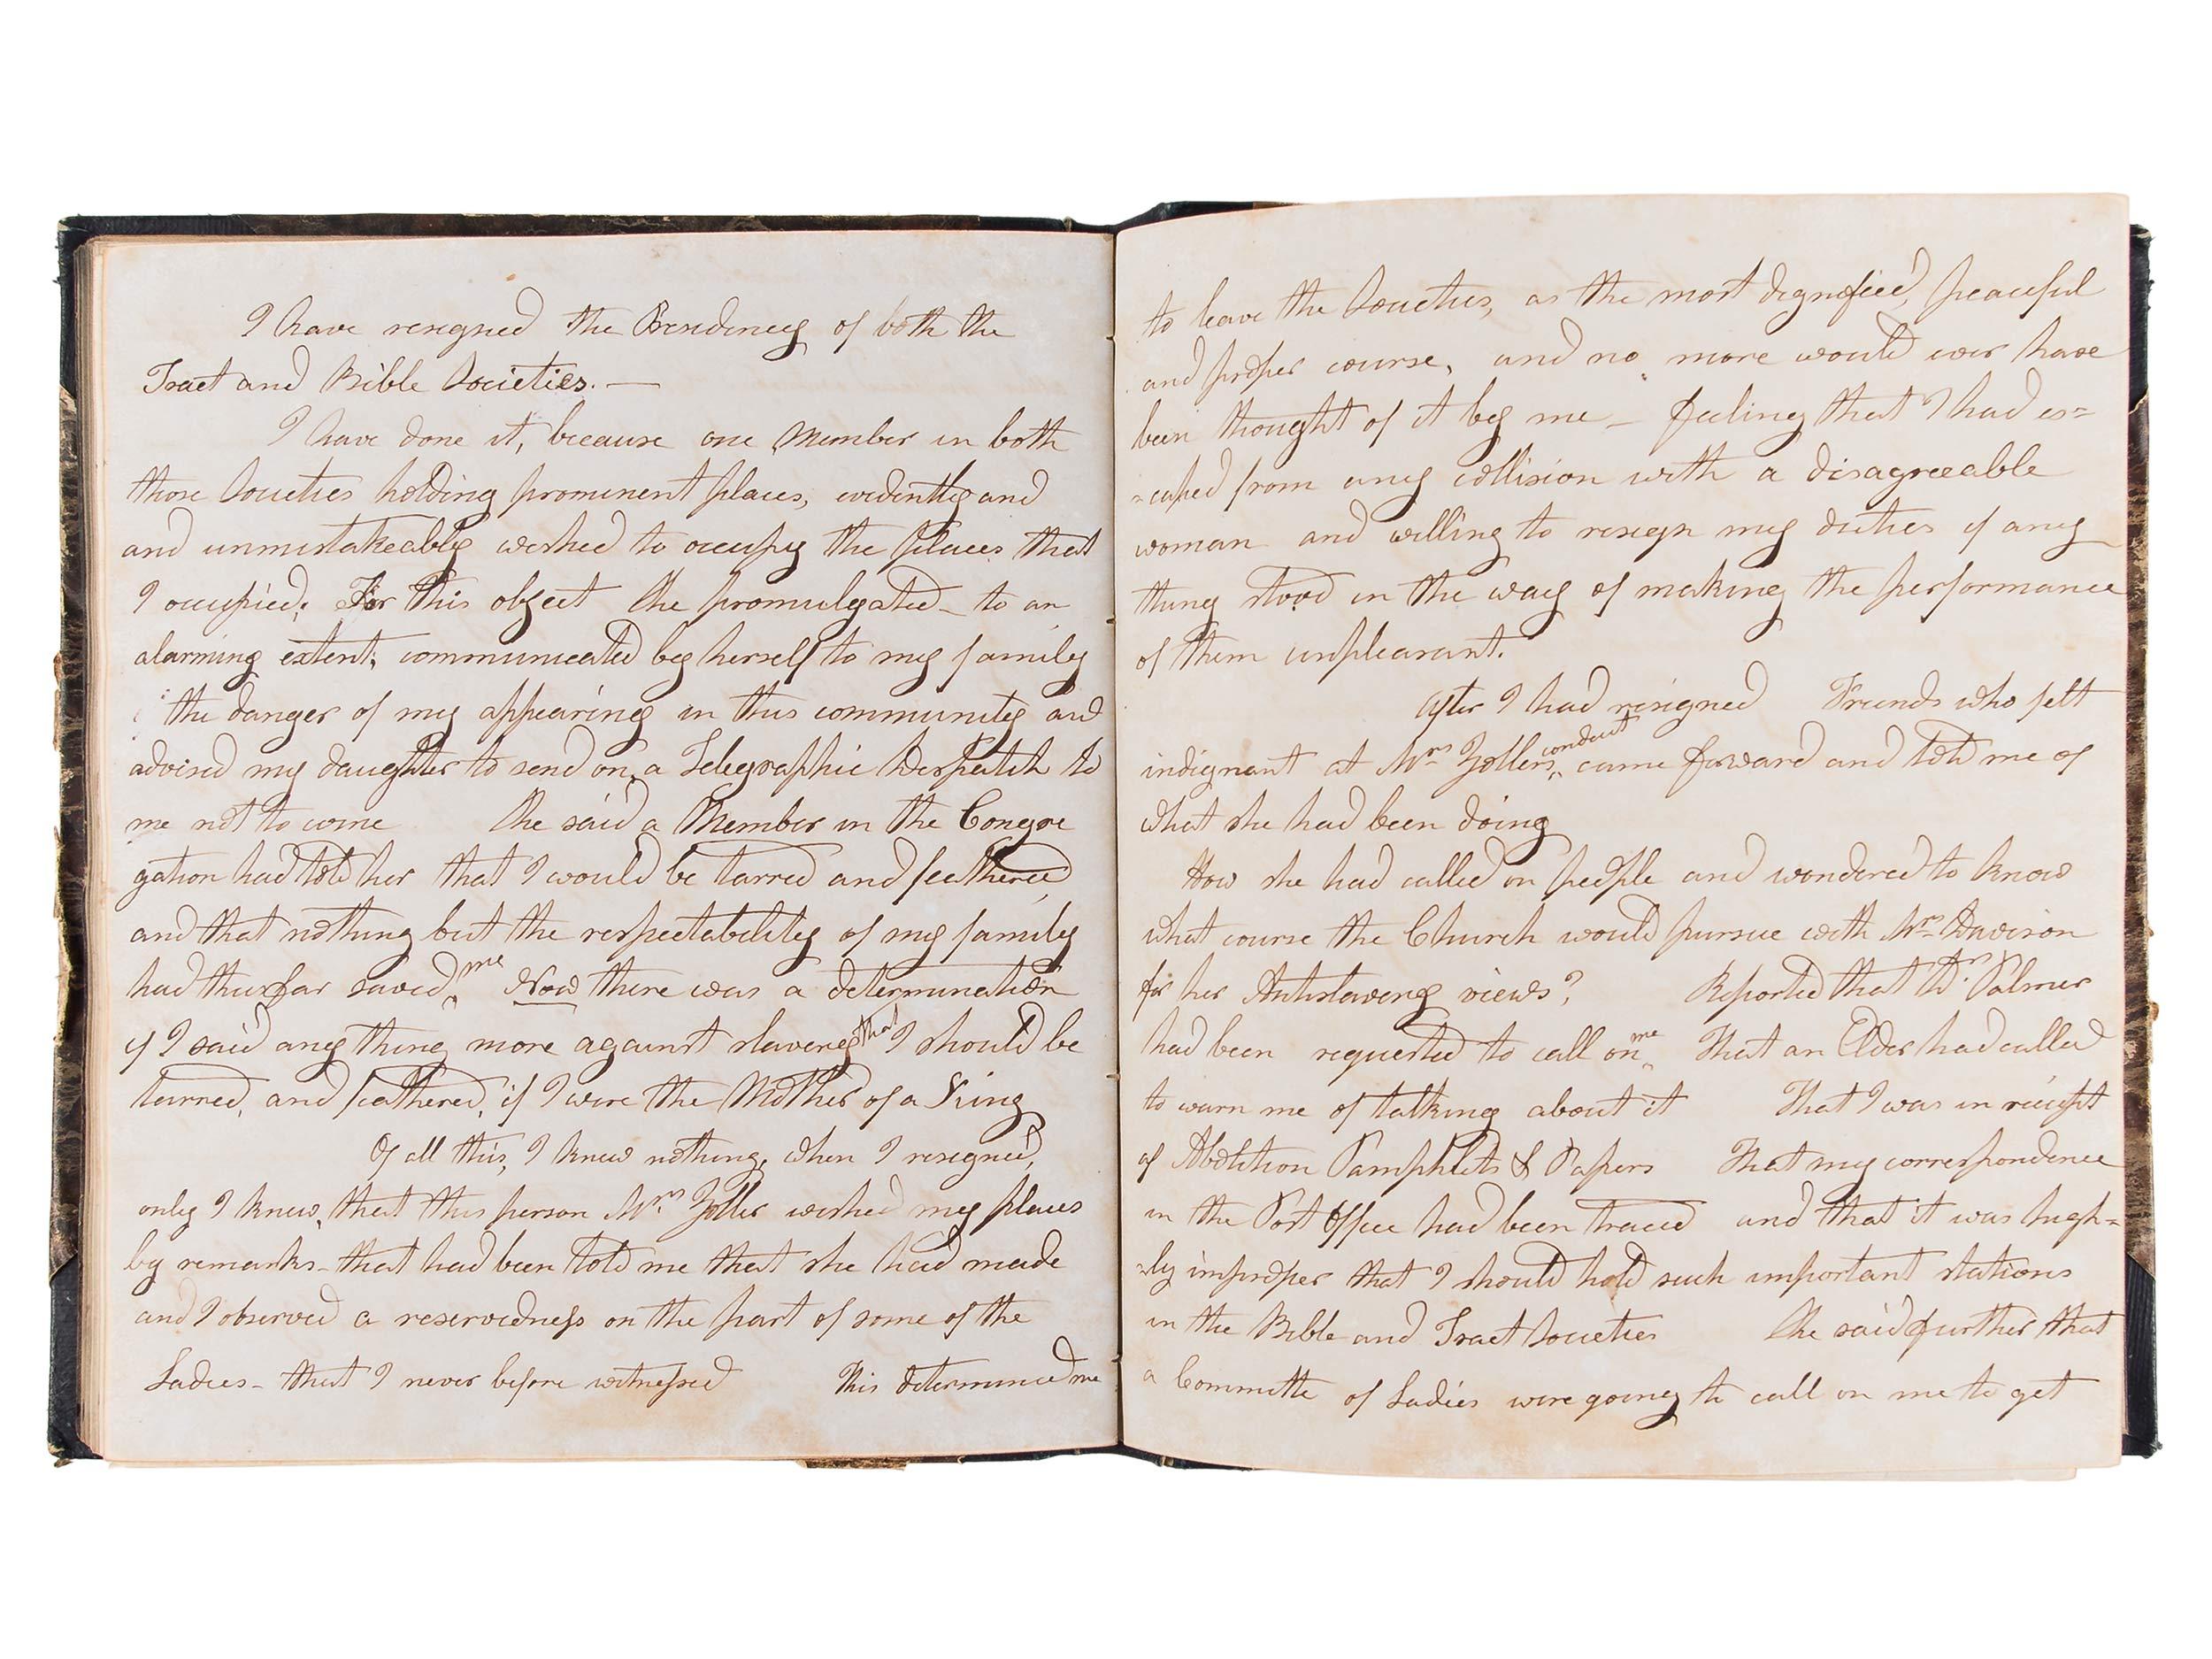 Ann Maria Davison diary, 1859